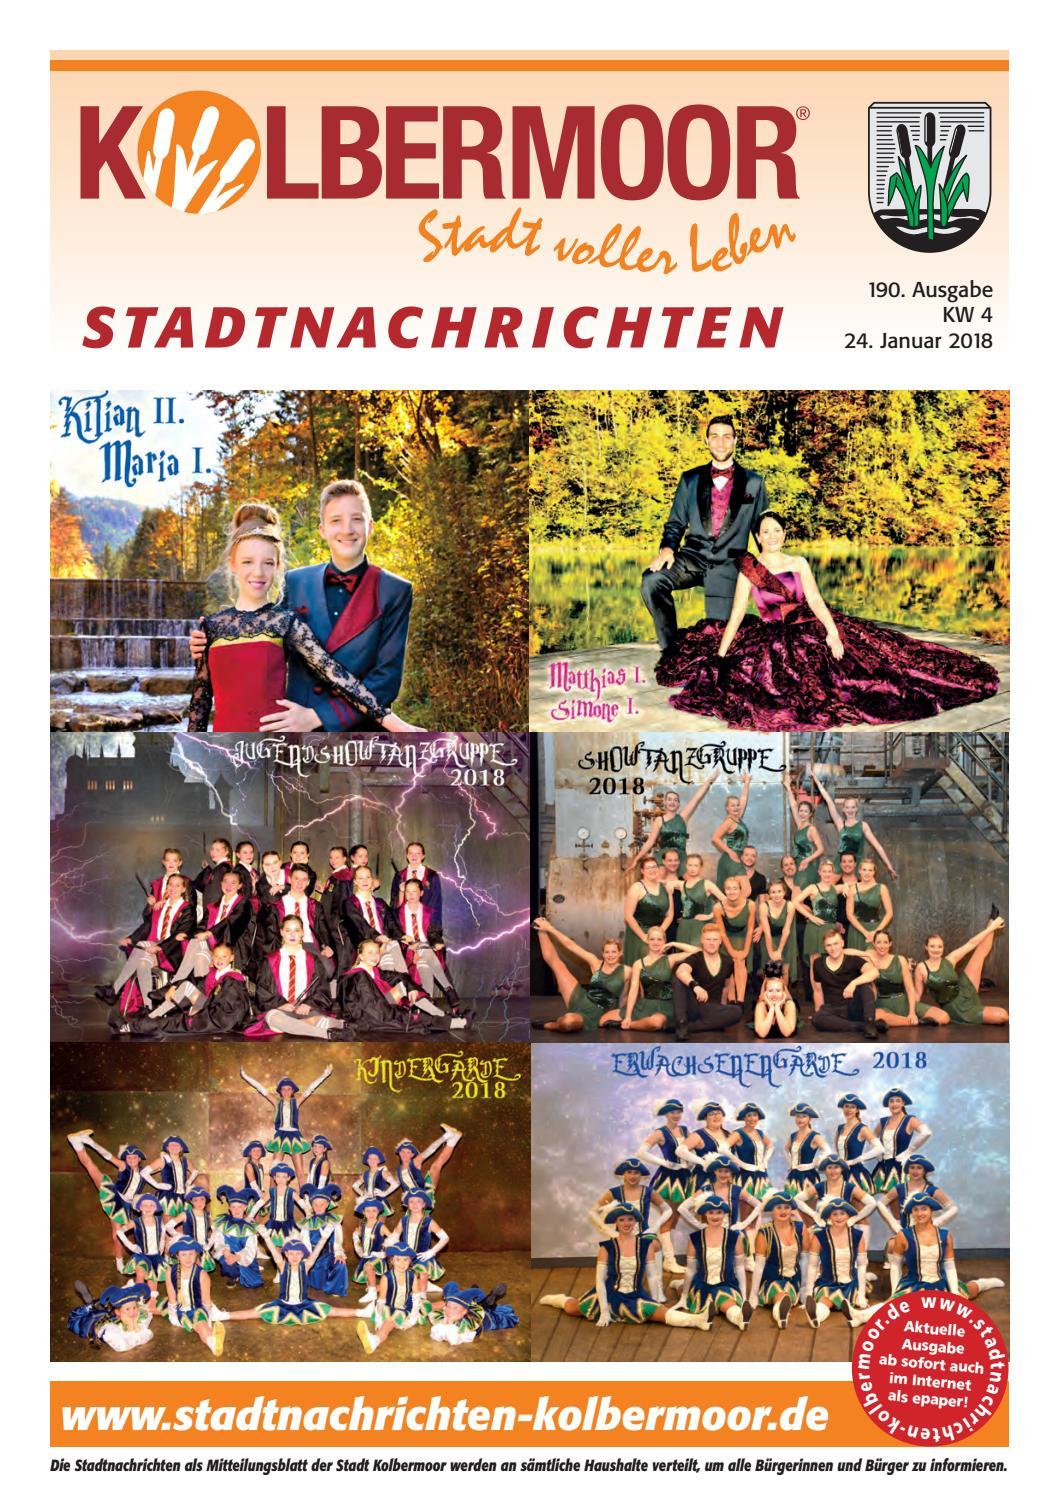 190 Stadtnachrichten Kolbermoor By Hans Peter Issuu